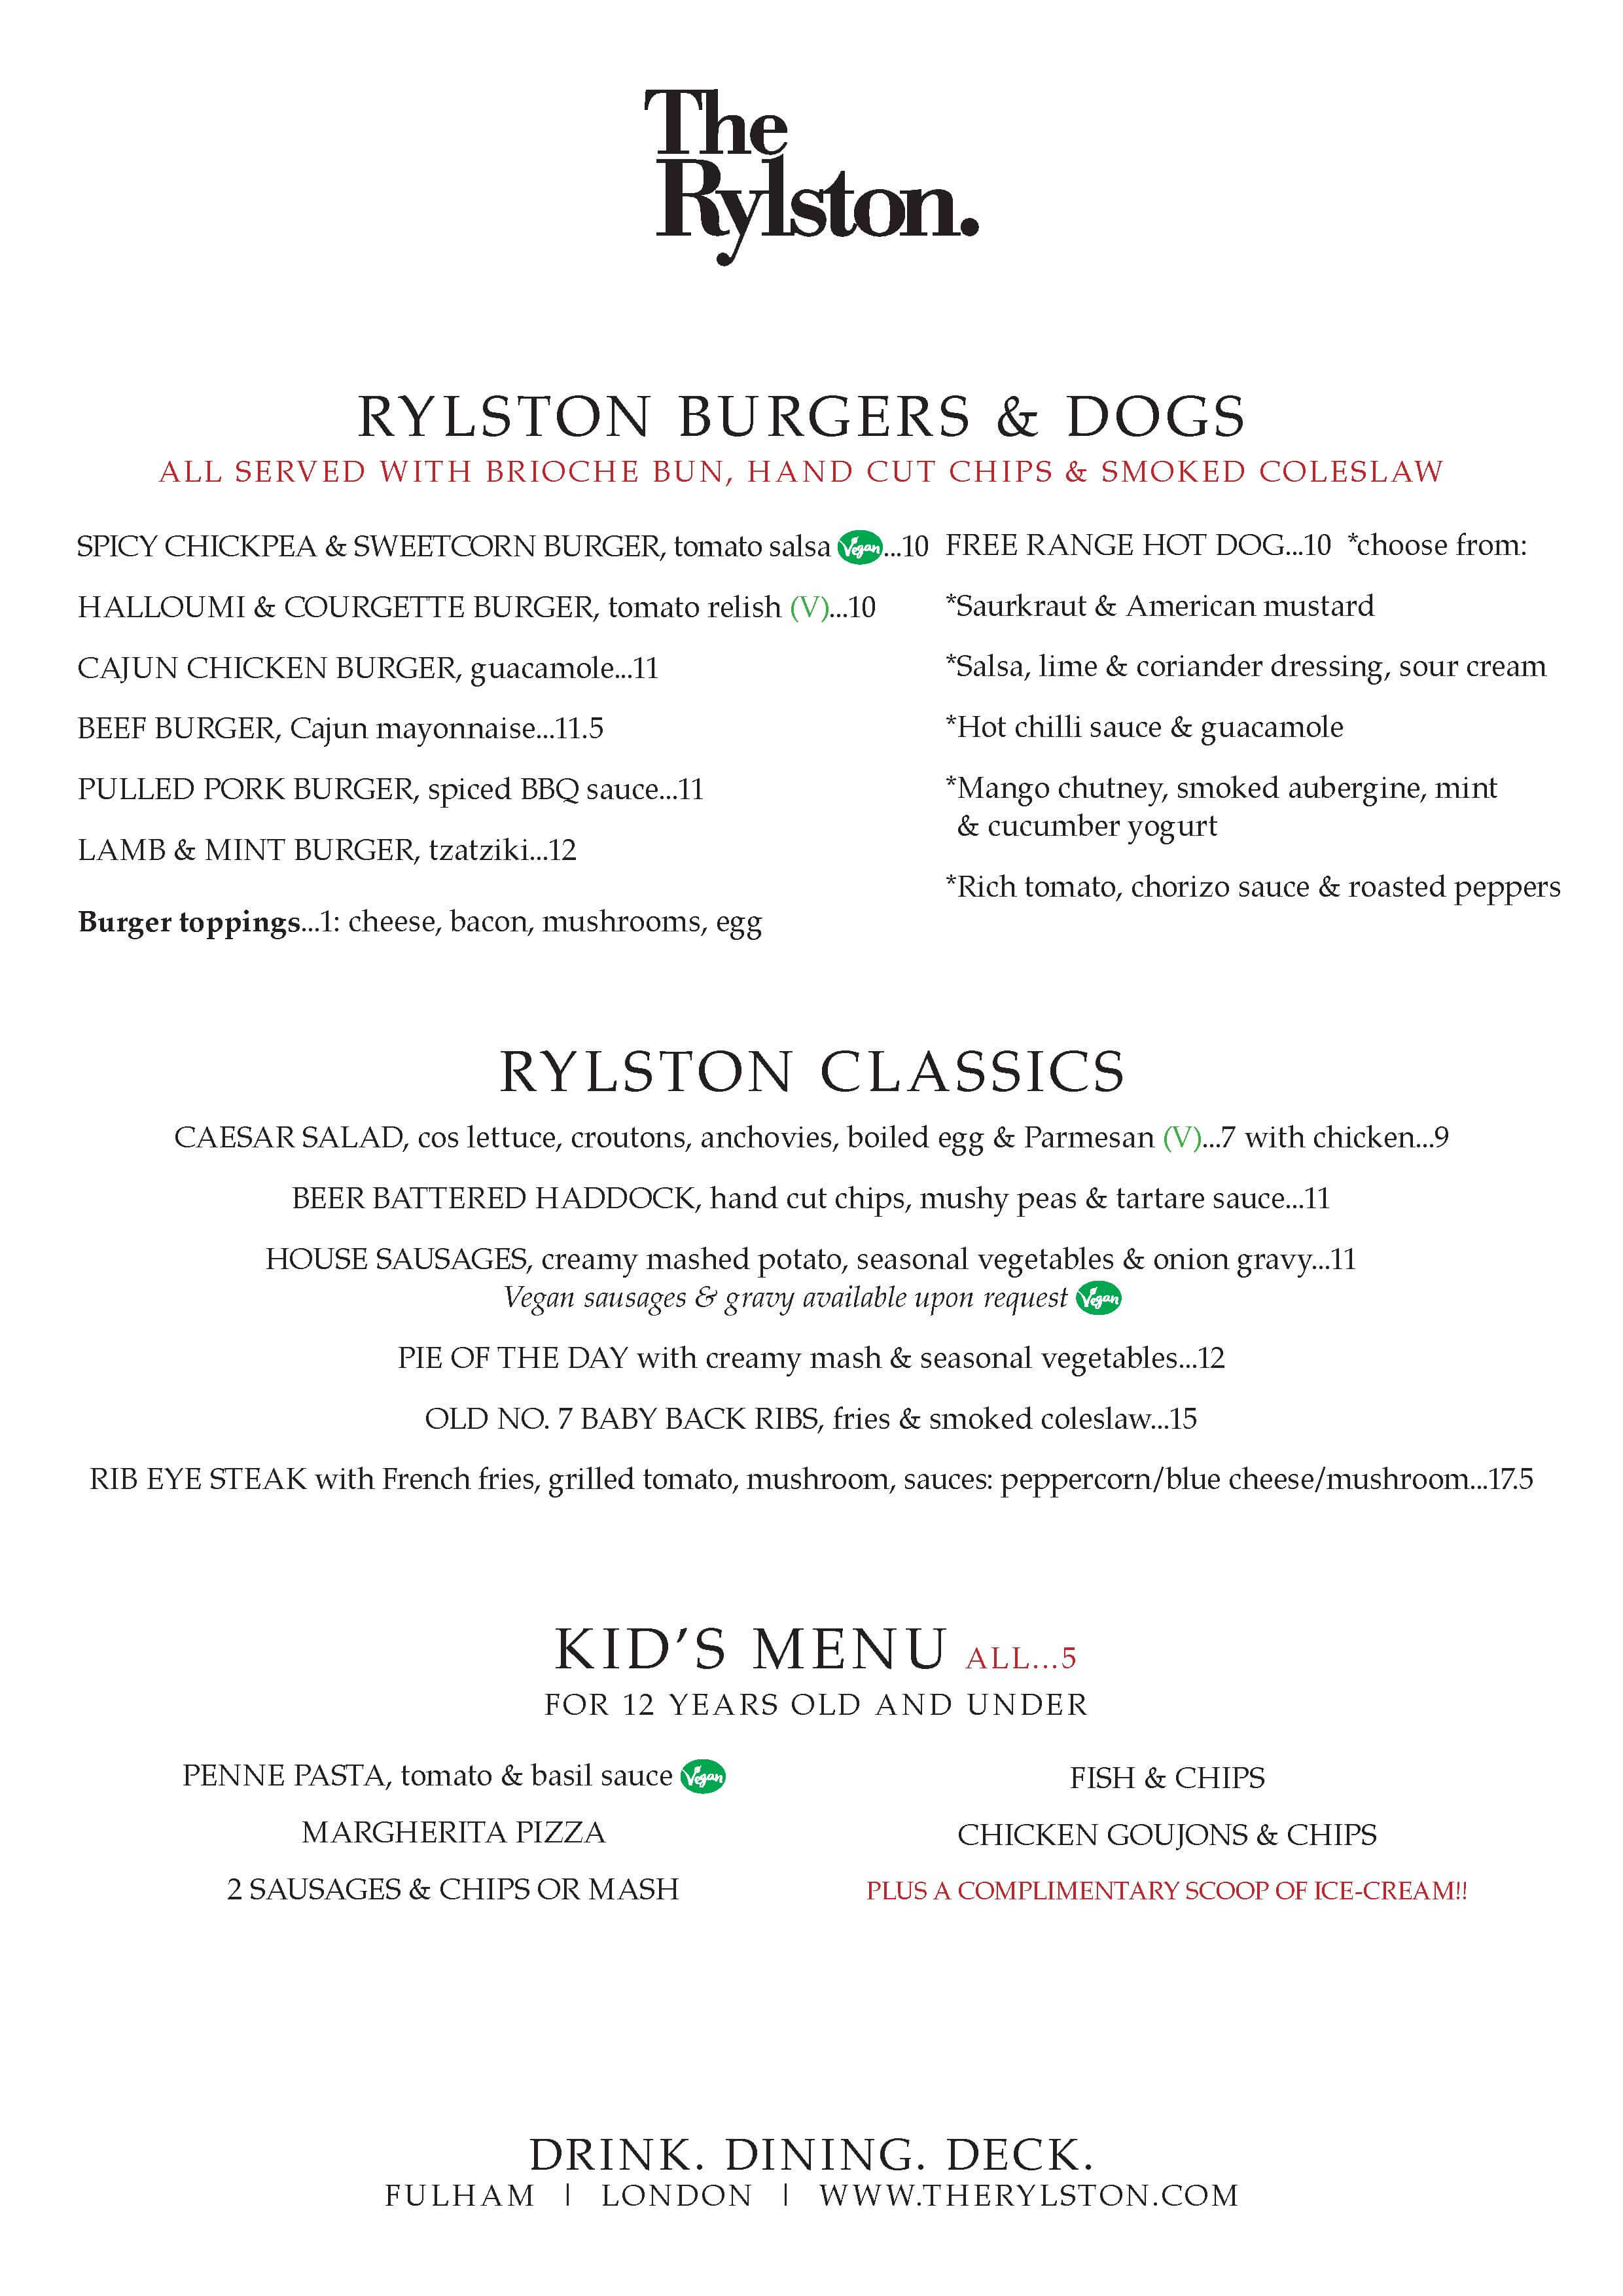 The Rylston Menu March 2017 P2